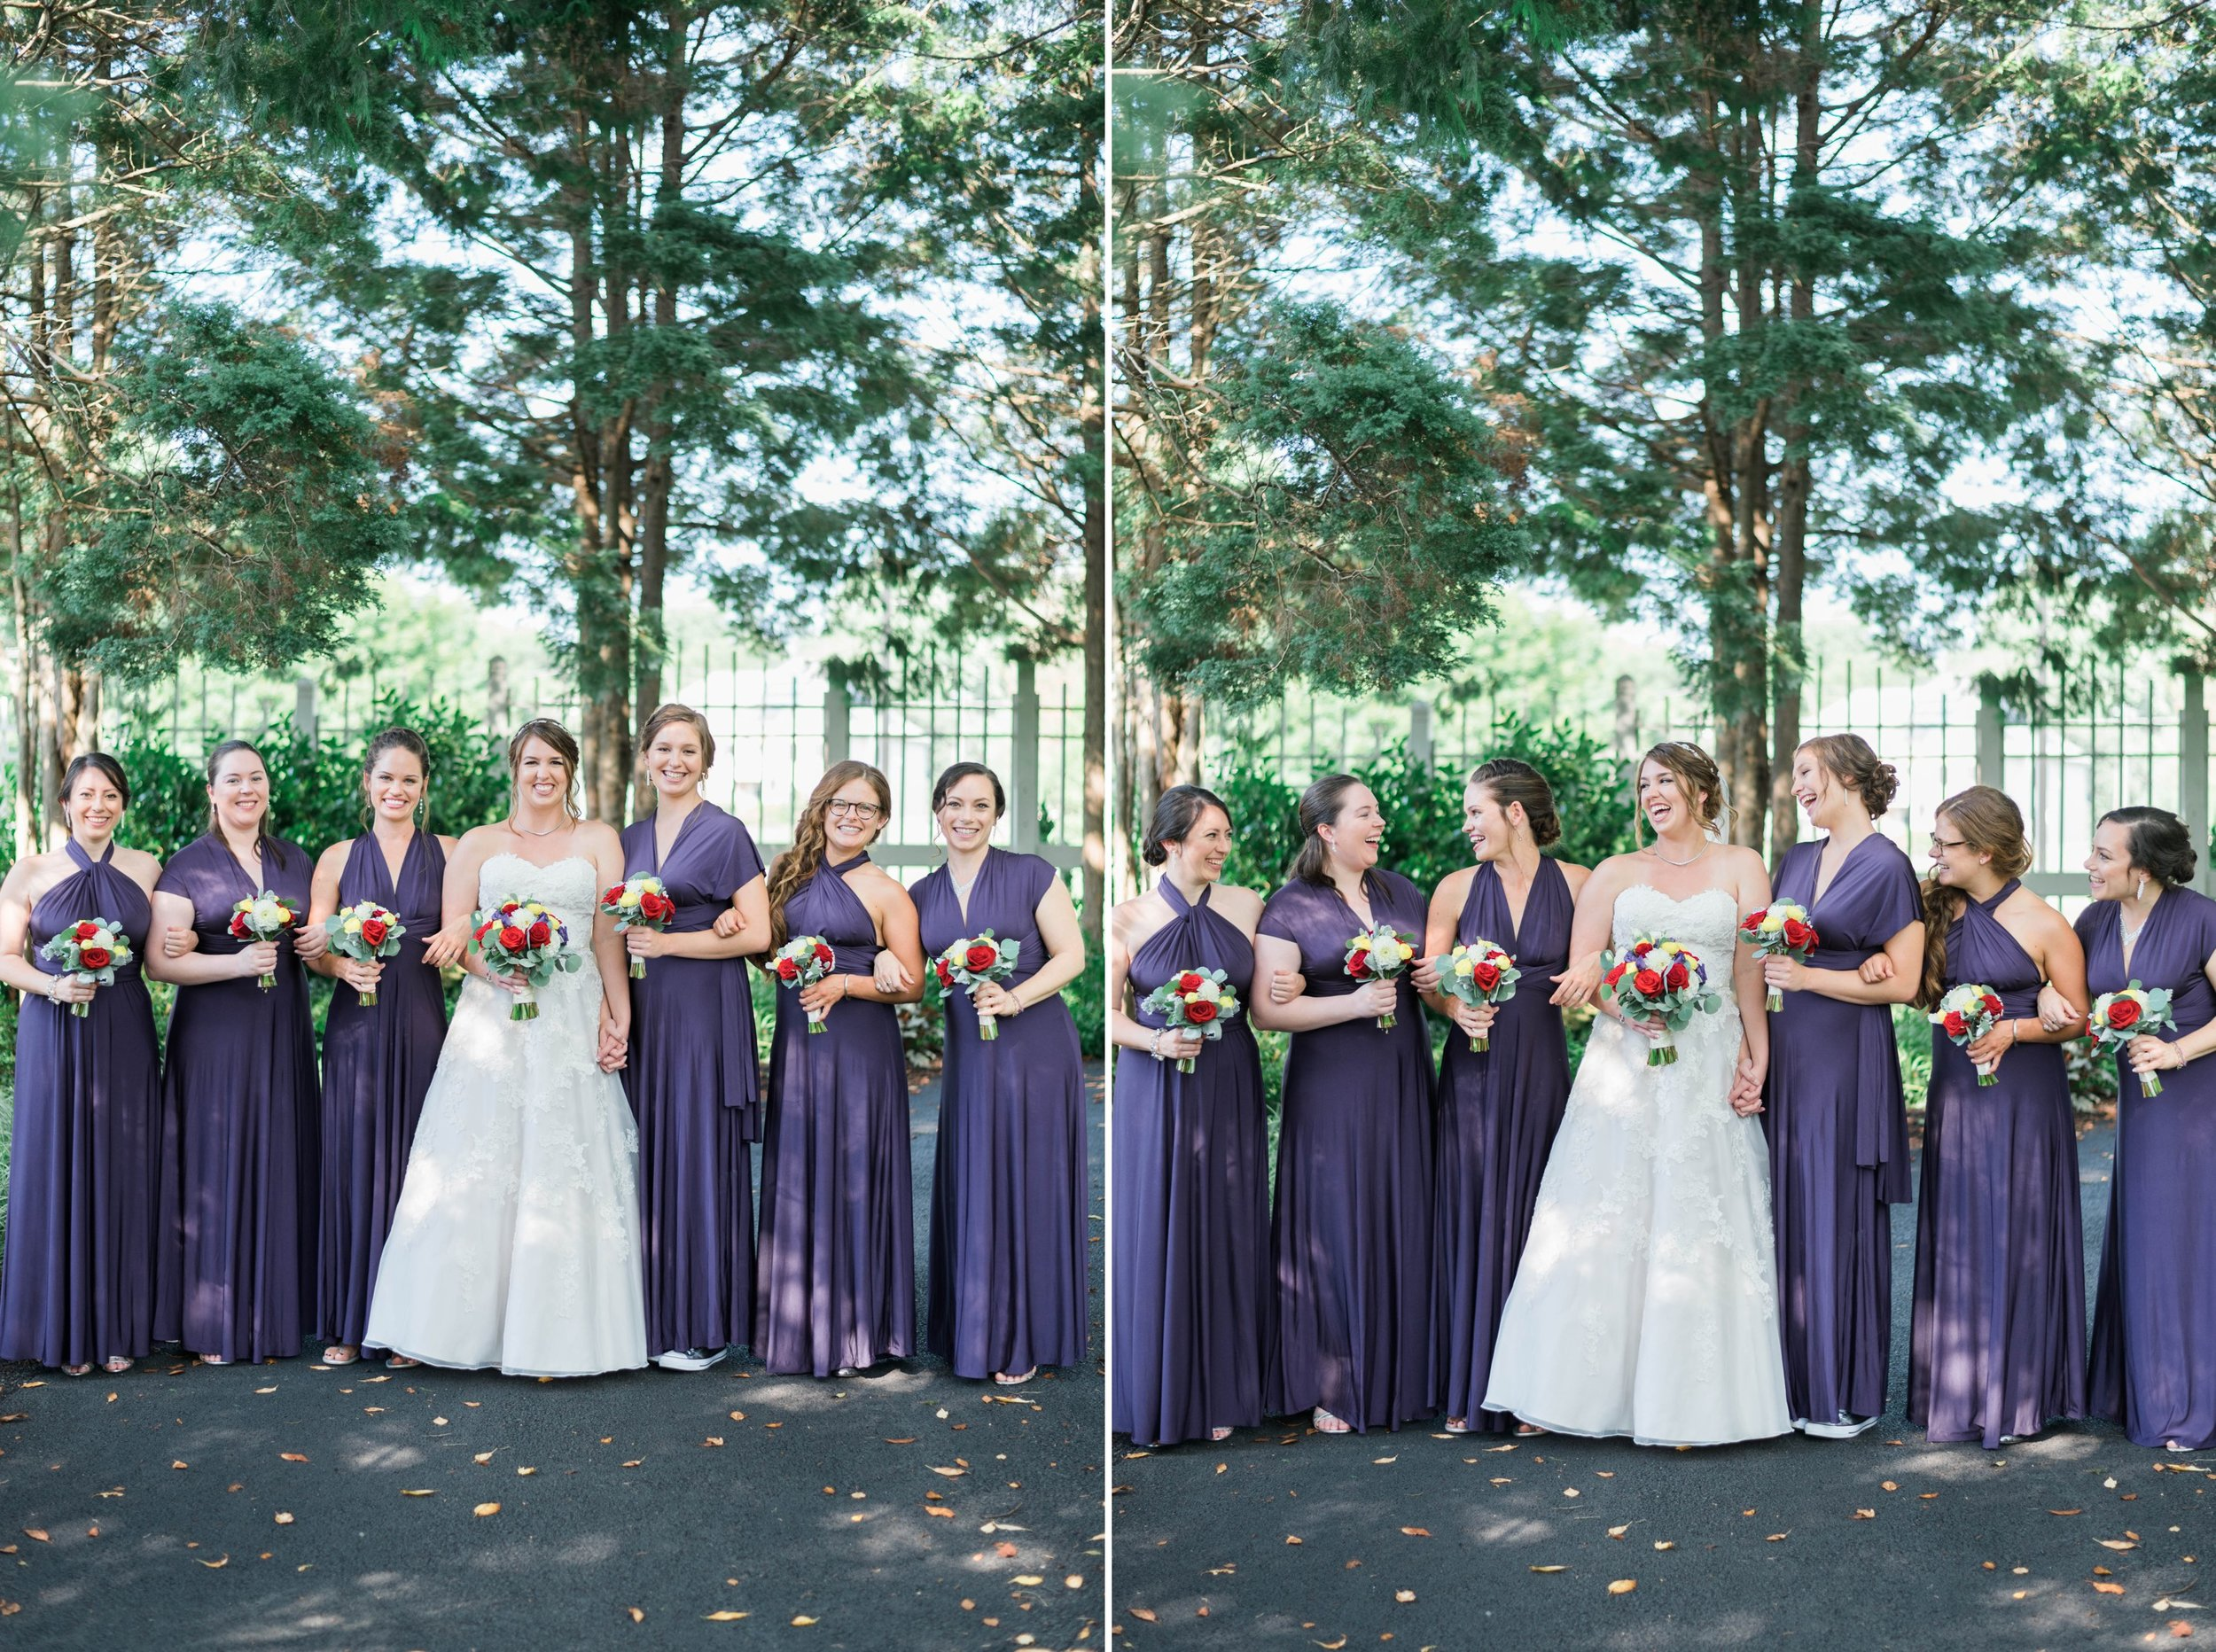 TheAtriumatMeadowlark_Virginiawedding photographer_lynchburgweddingphotographer_DCweddingPhotographer_KristinAaron 7.jpg